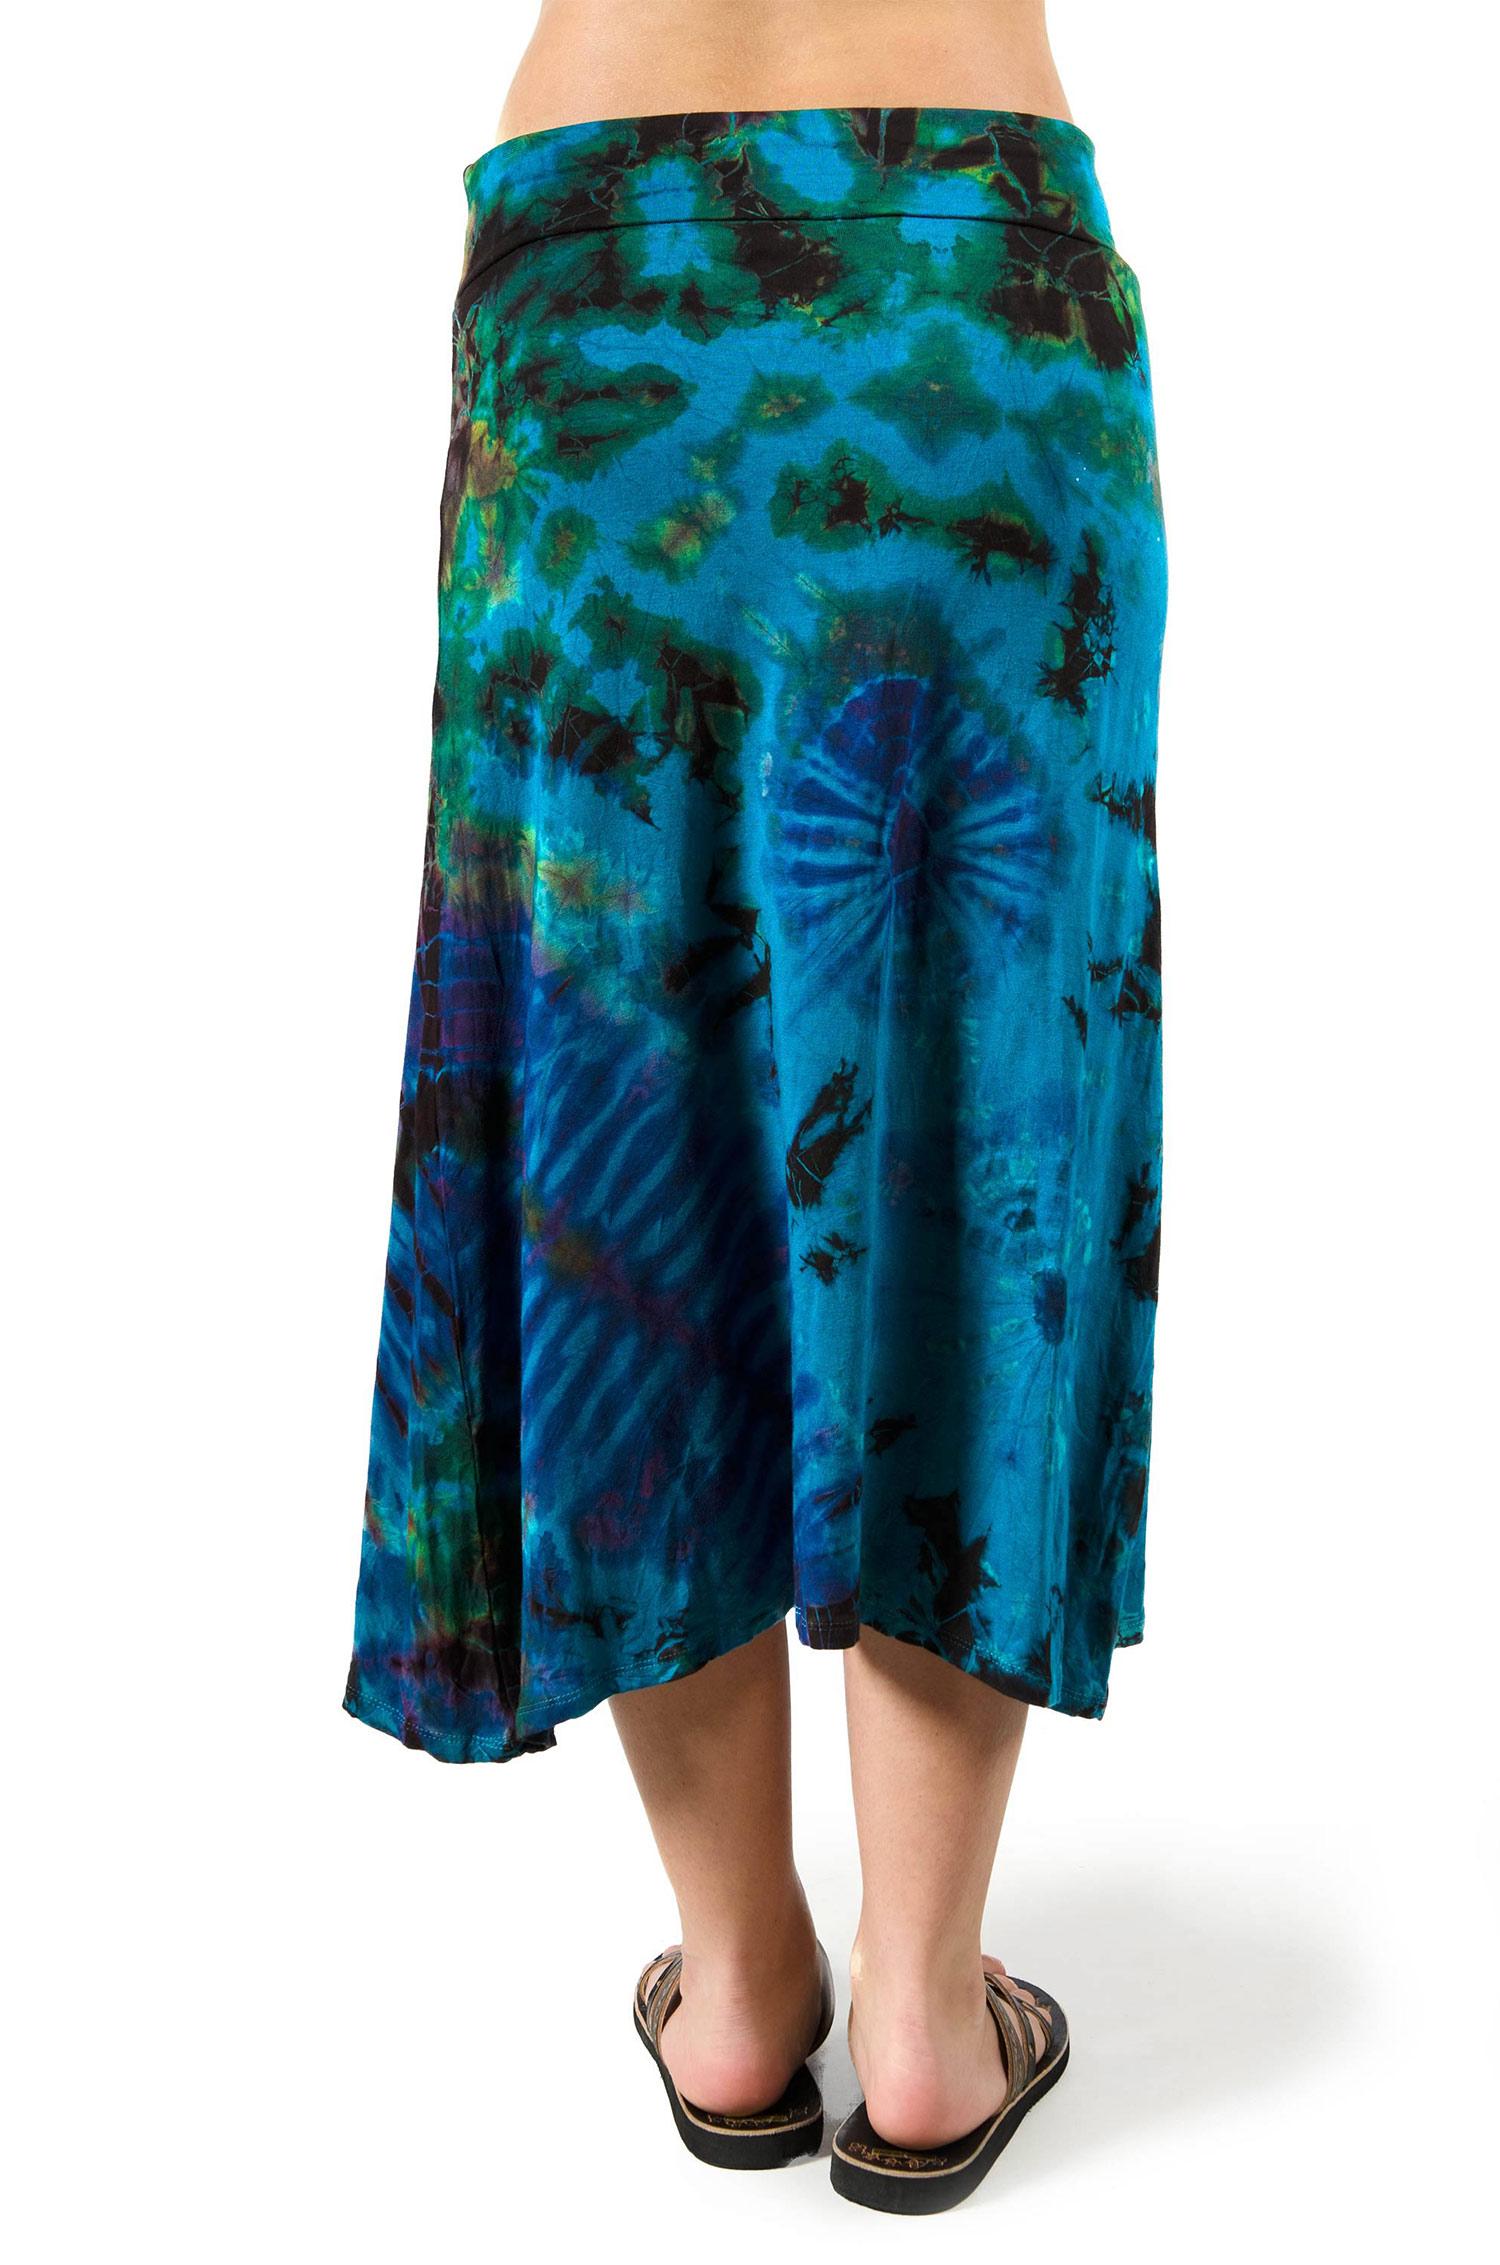 Hand Painted Tie Dye A-Line Midi Skirt - Teal Multi - 3428T